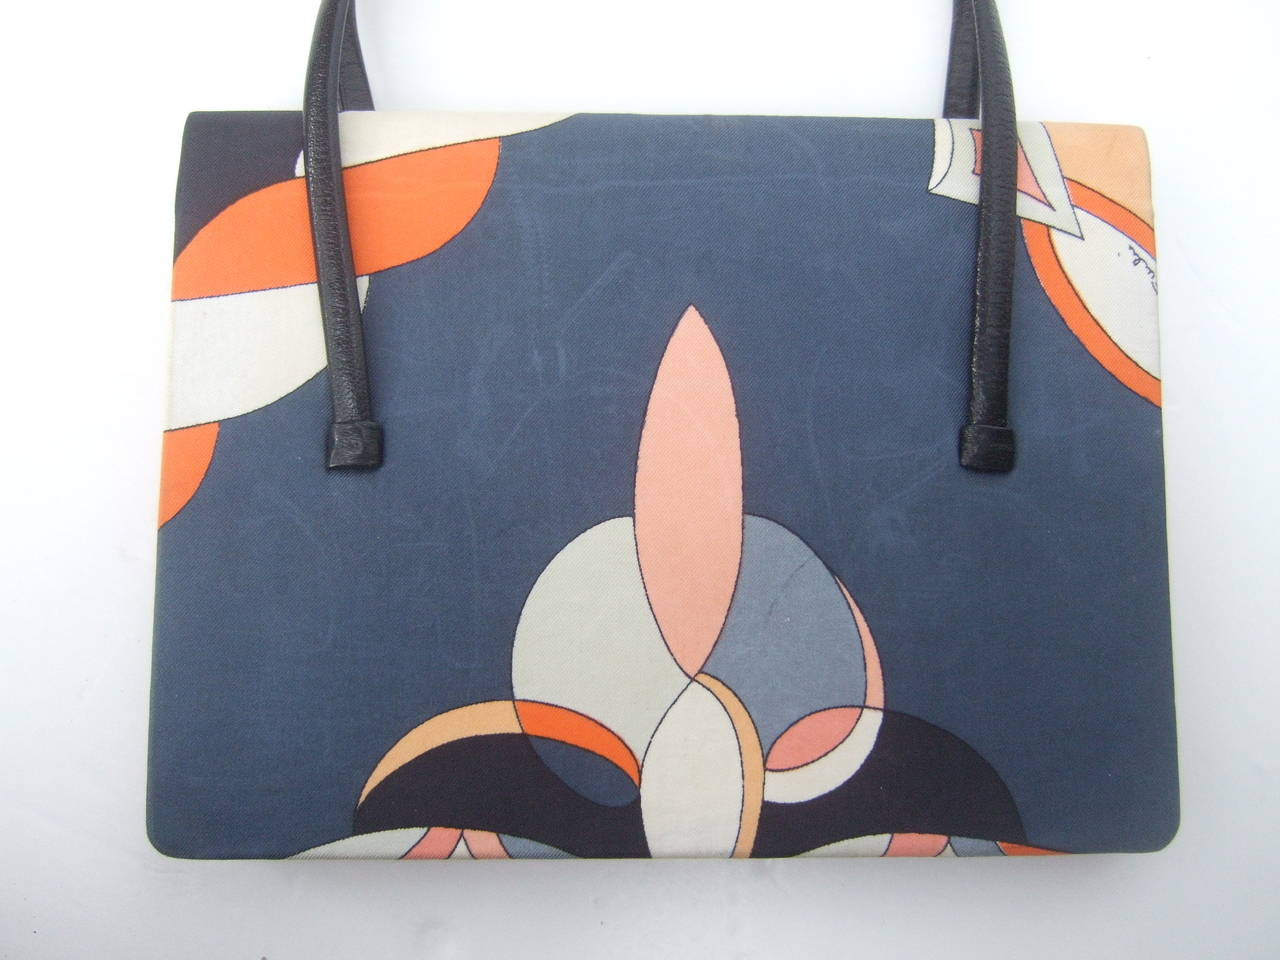 Emilio Pucci Italy Silk Diminutive Envelope Style Handbag c 1970 For Sale 4